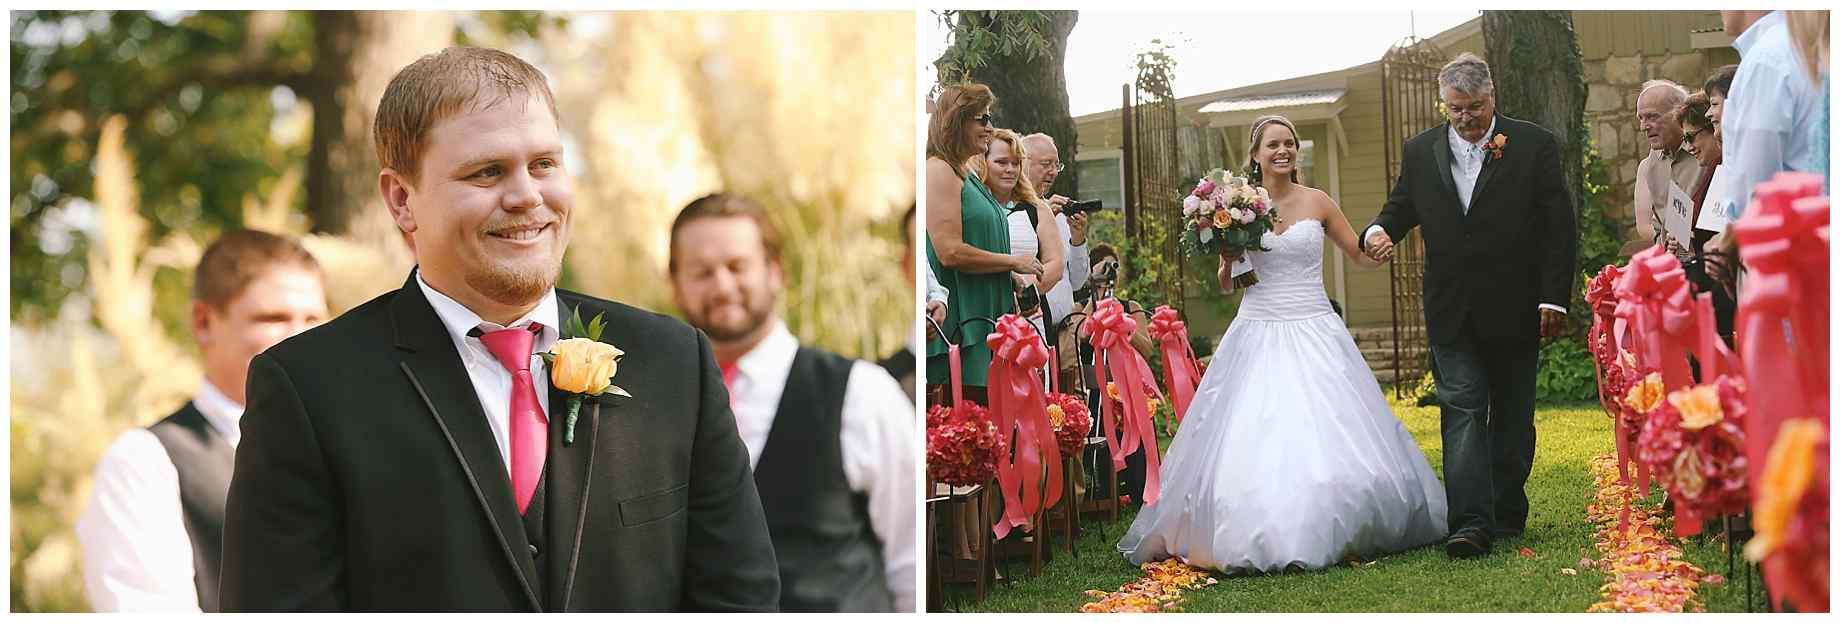 pecan-springs-ranch-austin-tx-wedding-014